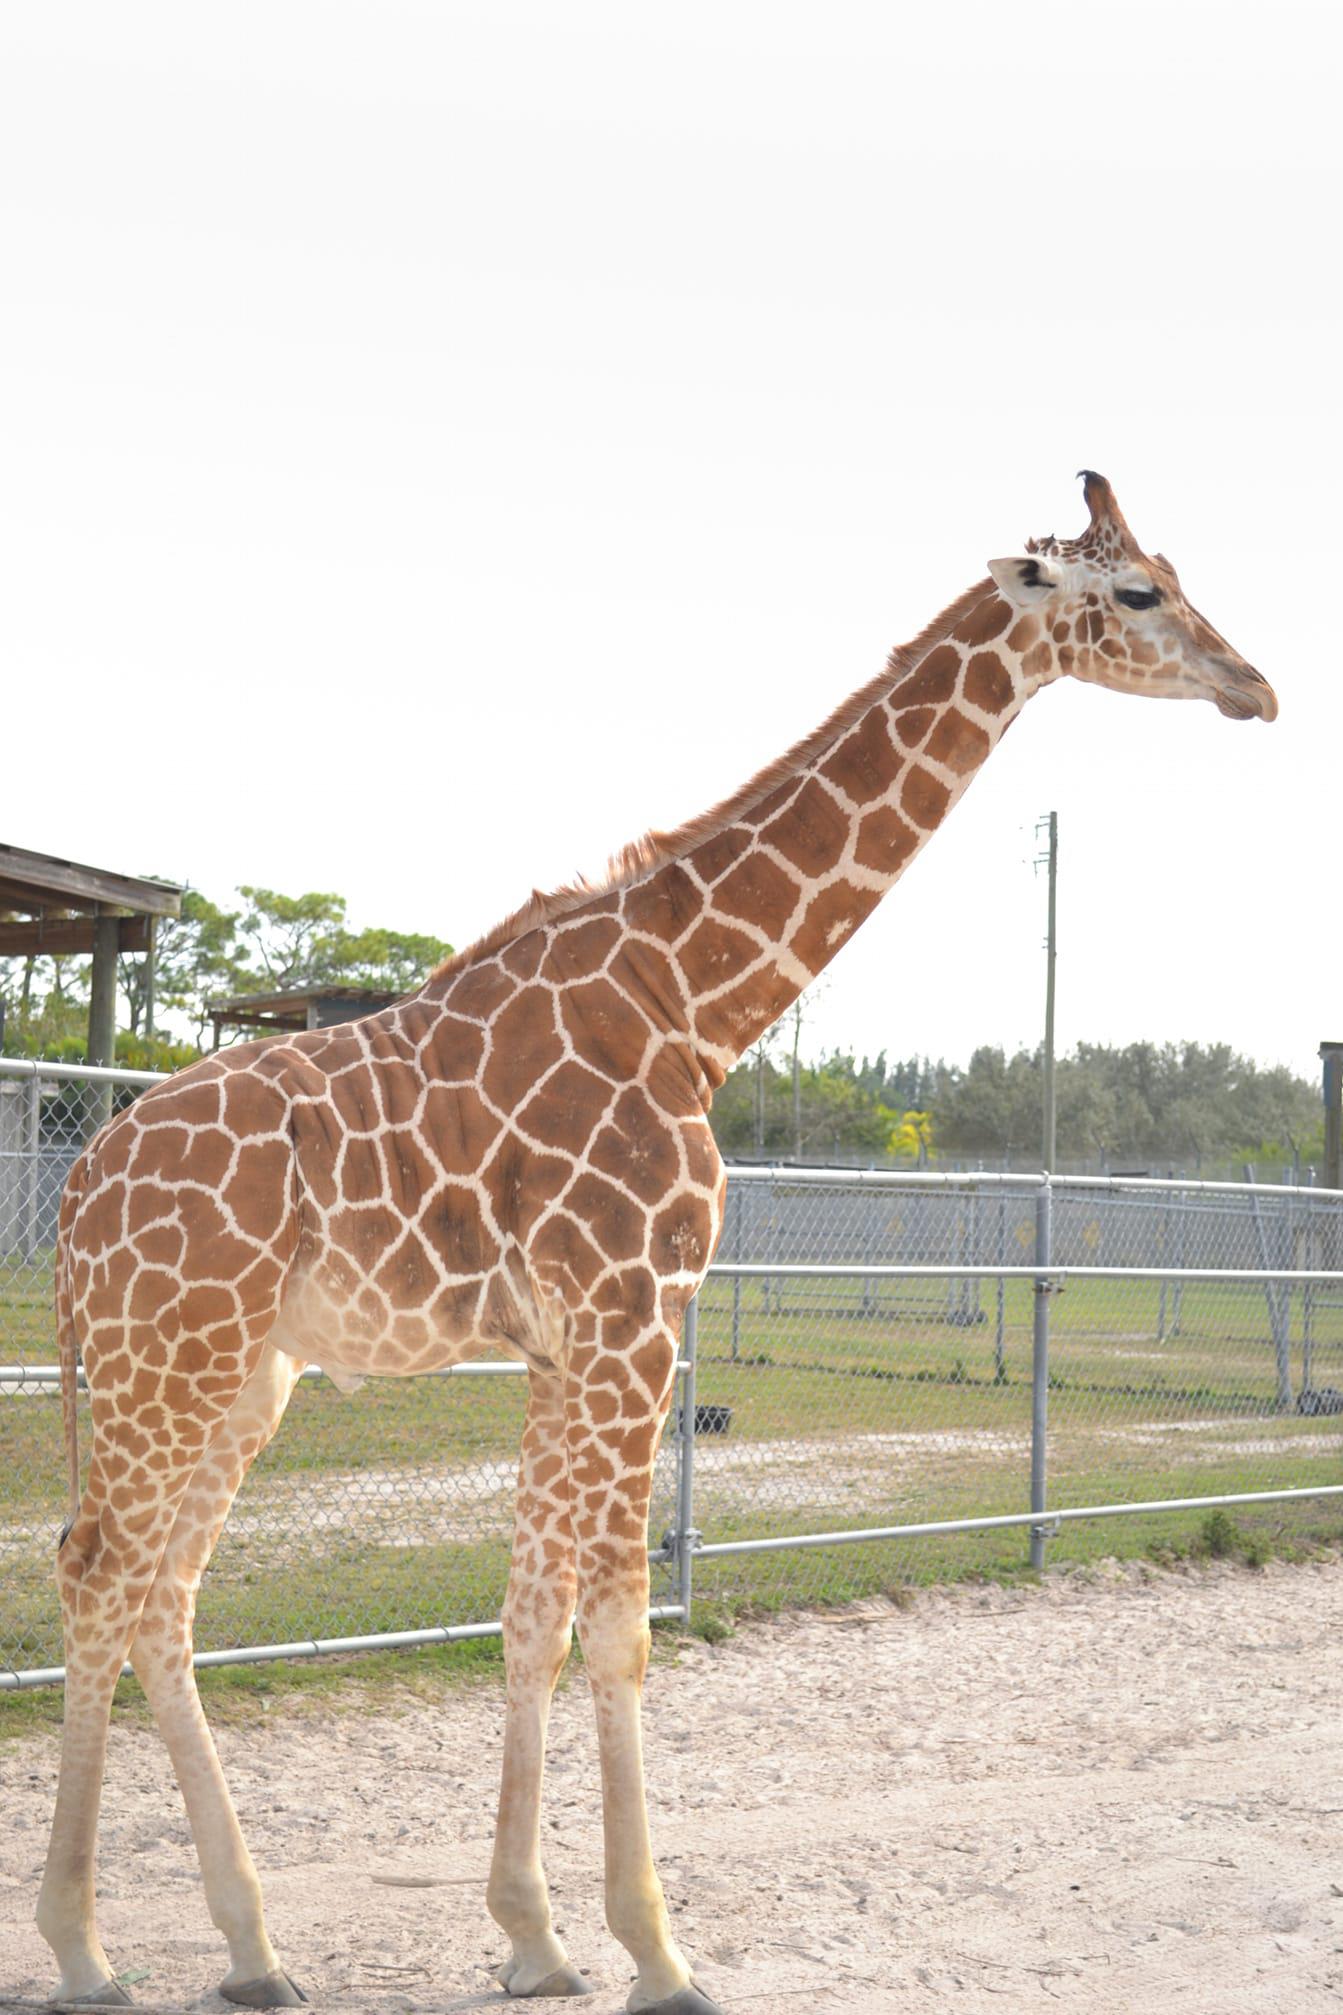 Two Giraffes Killed By Billion To One Lightning Strike At Florida Wildlife Park